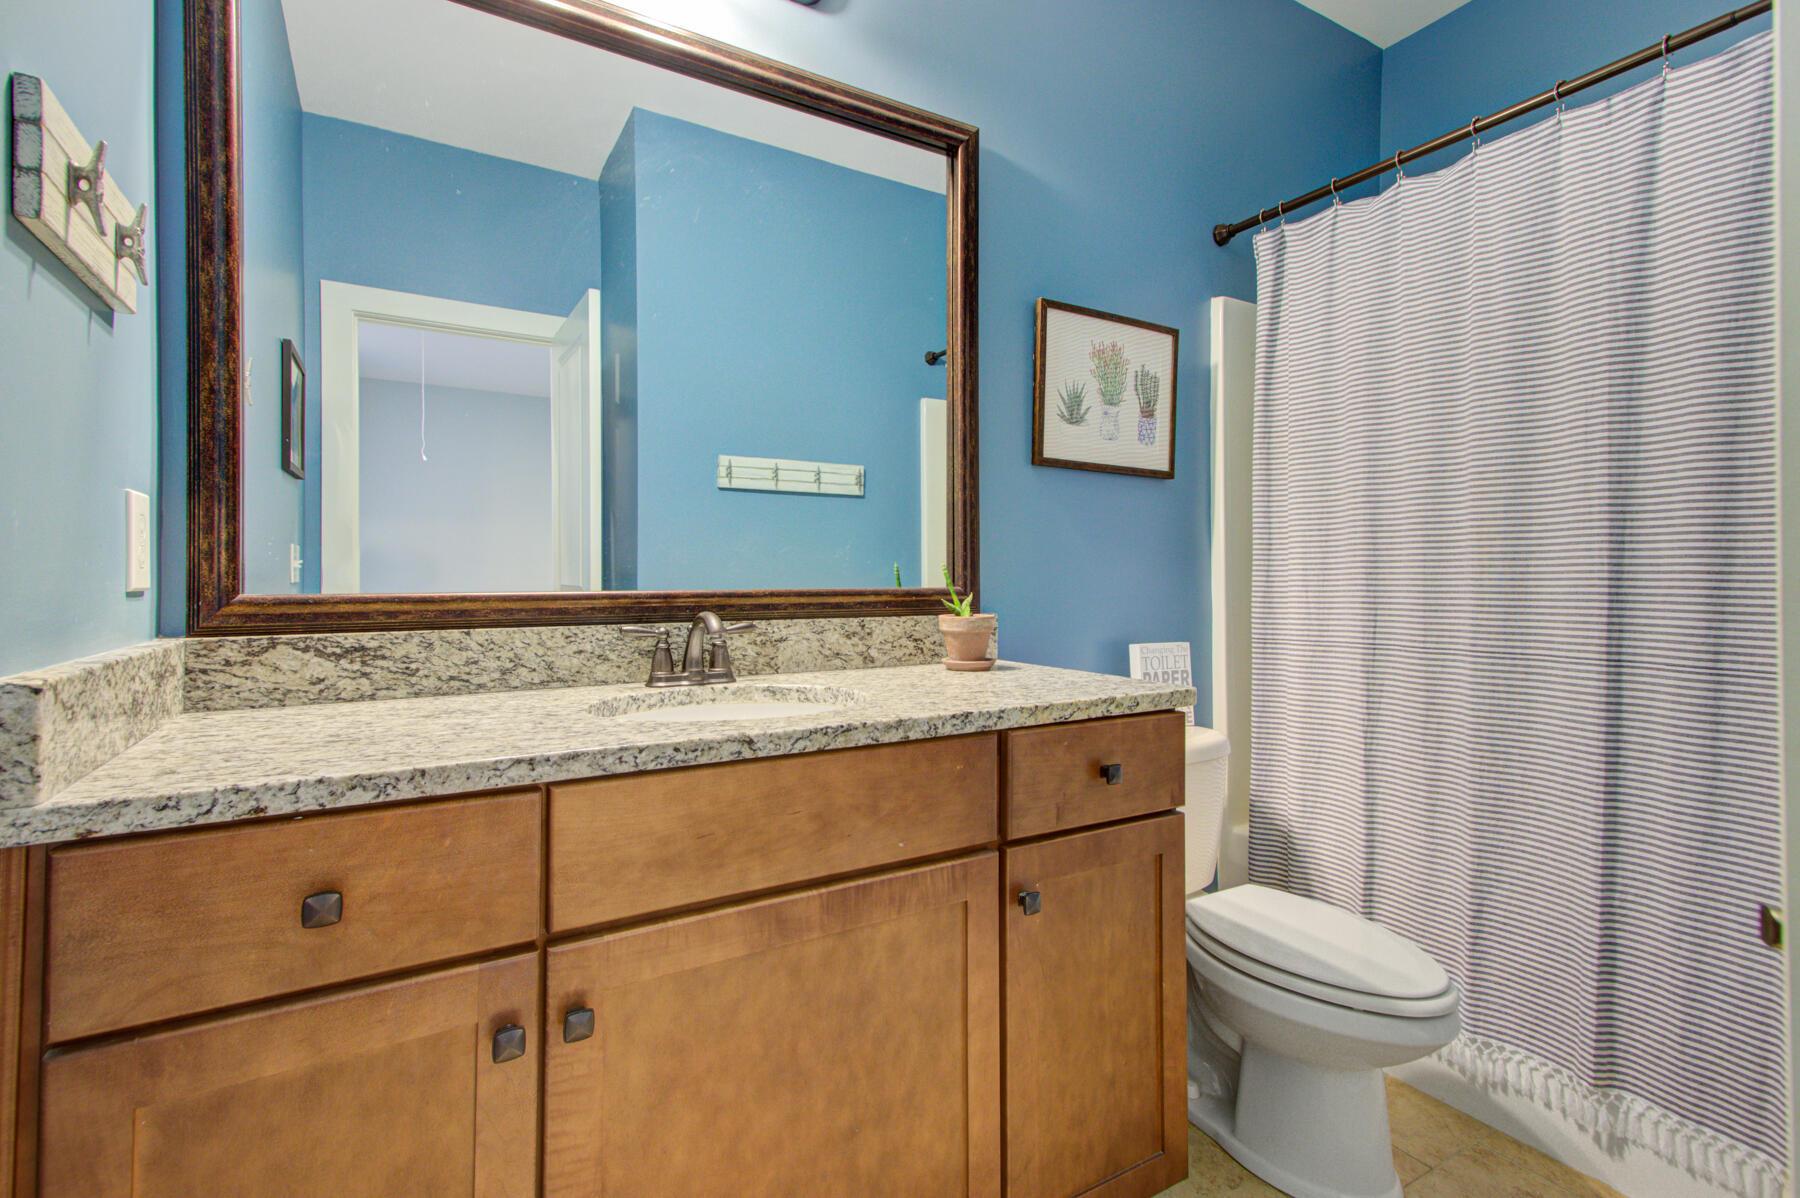 Etiwan Pointe Homes For Sale - 254 Slipper Shell, Mount Pleasant, SC - 36